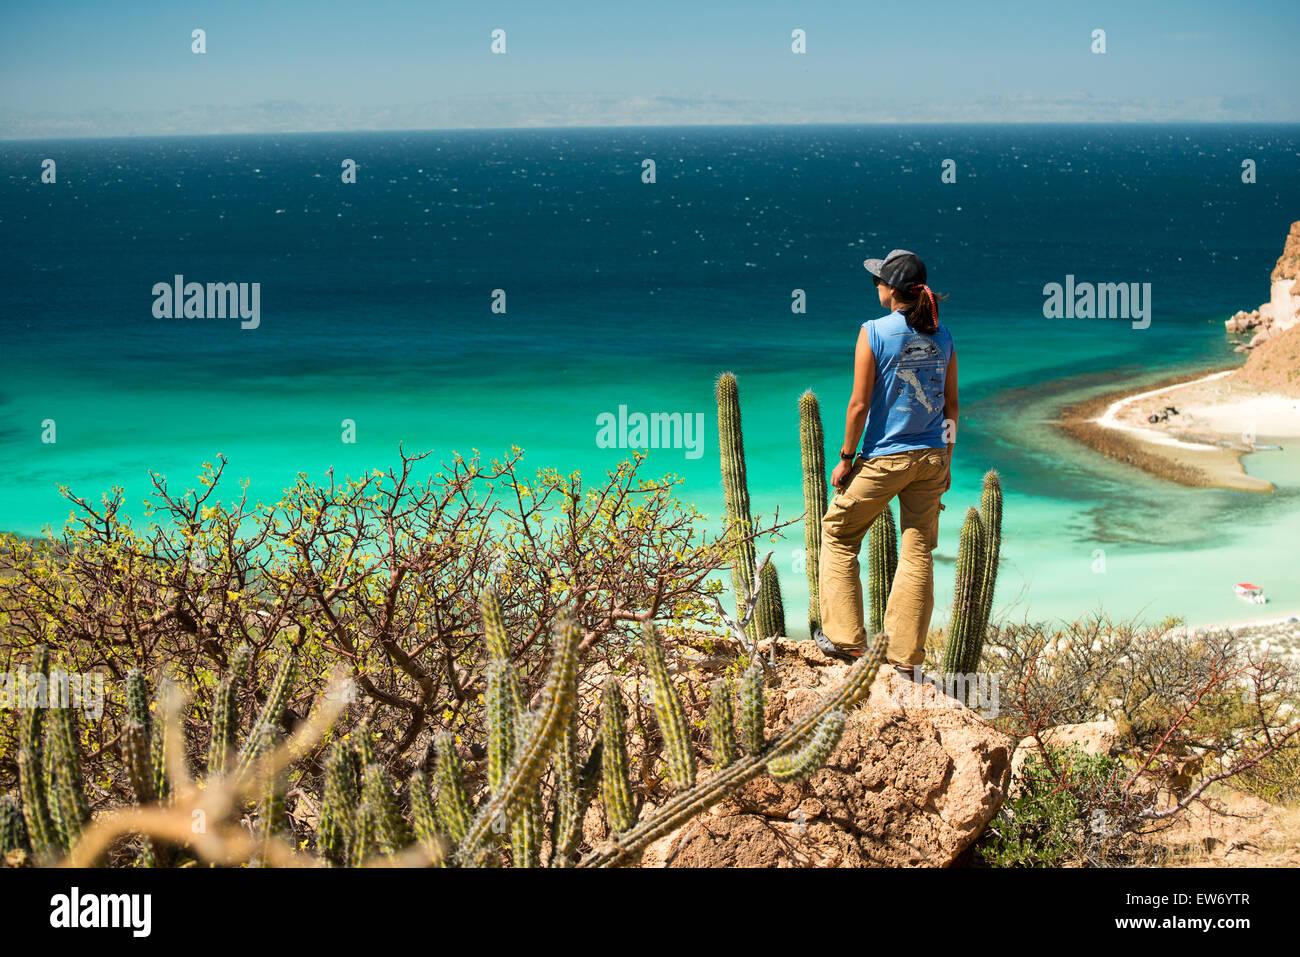 Mexico, Baja, Lapaz, Espiritu Santo. Woman standing on rock. - Stock Image